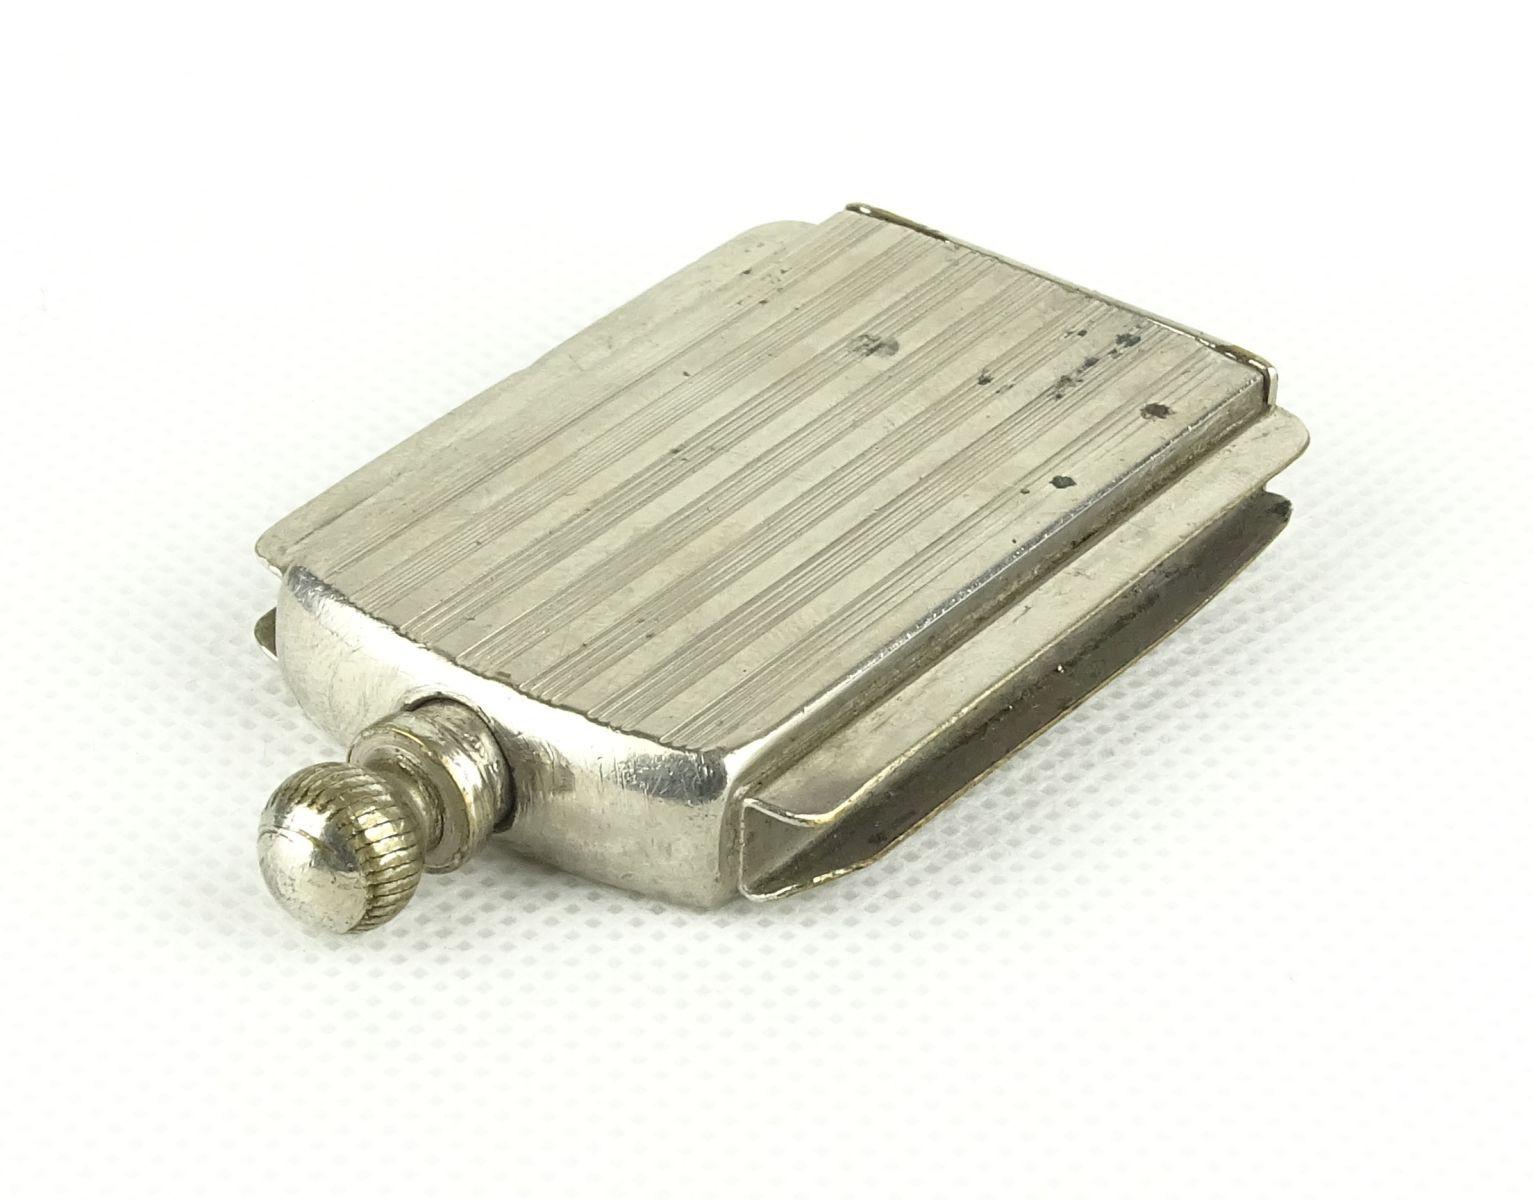 DSC00810.JPG (1533×1200)